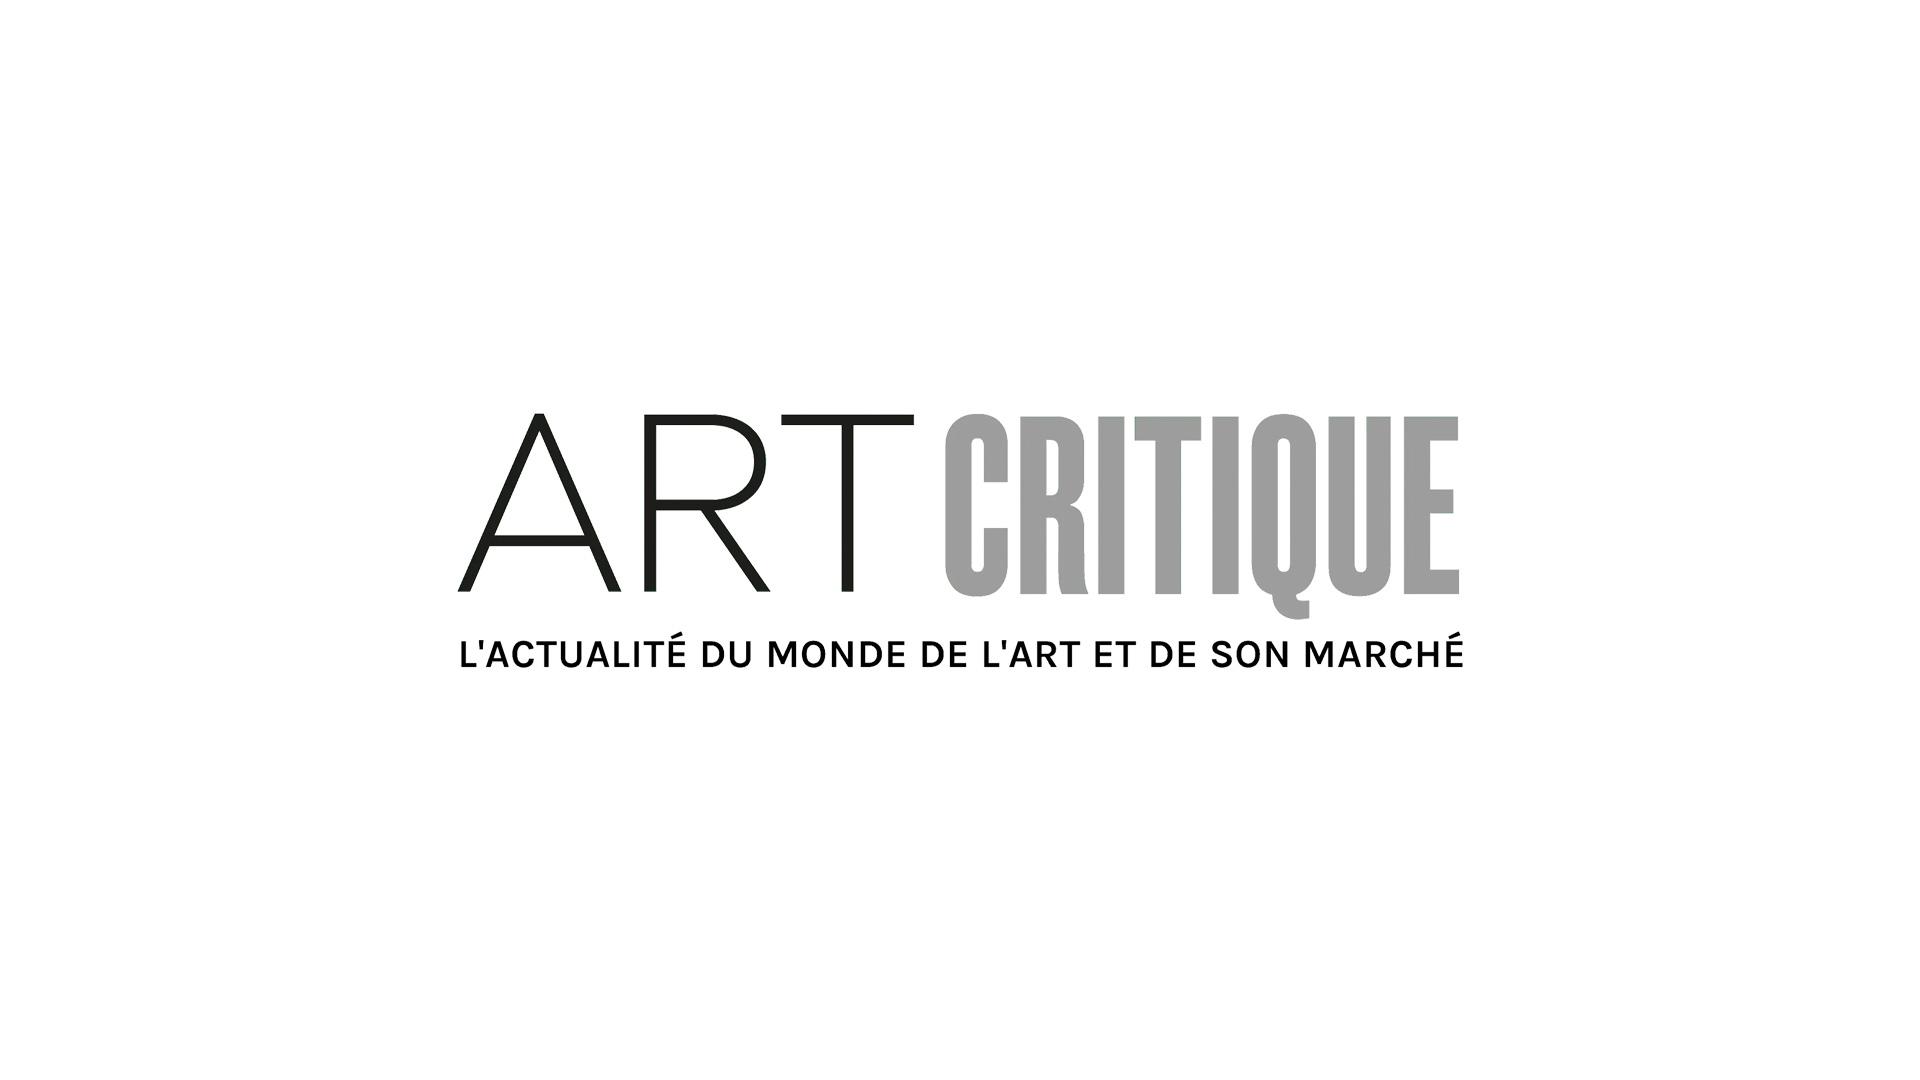 Works by Salvador Dalí stolen from Stockholm gallery